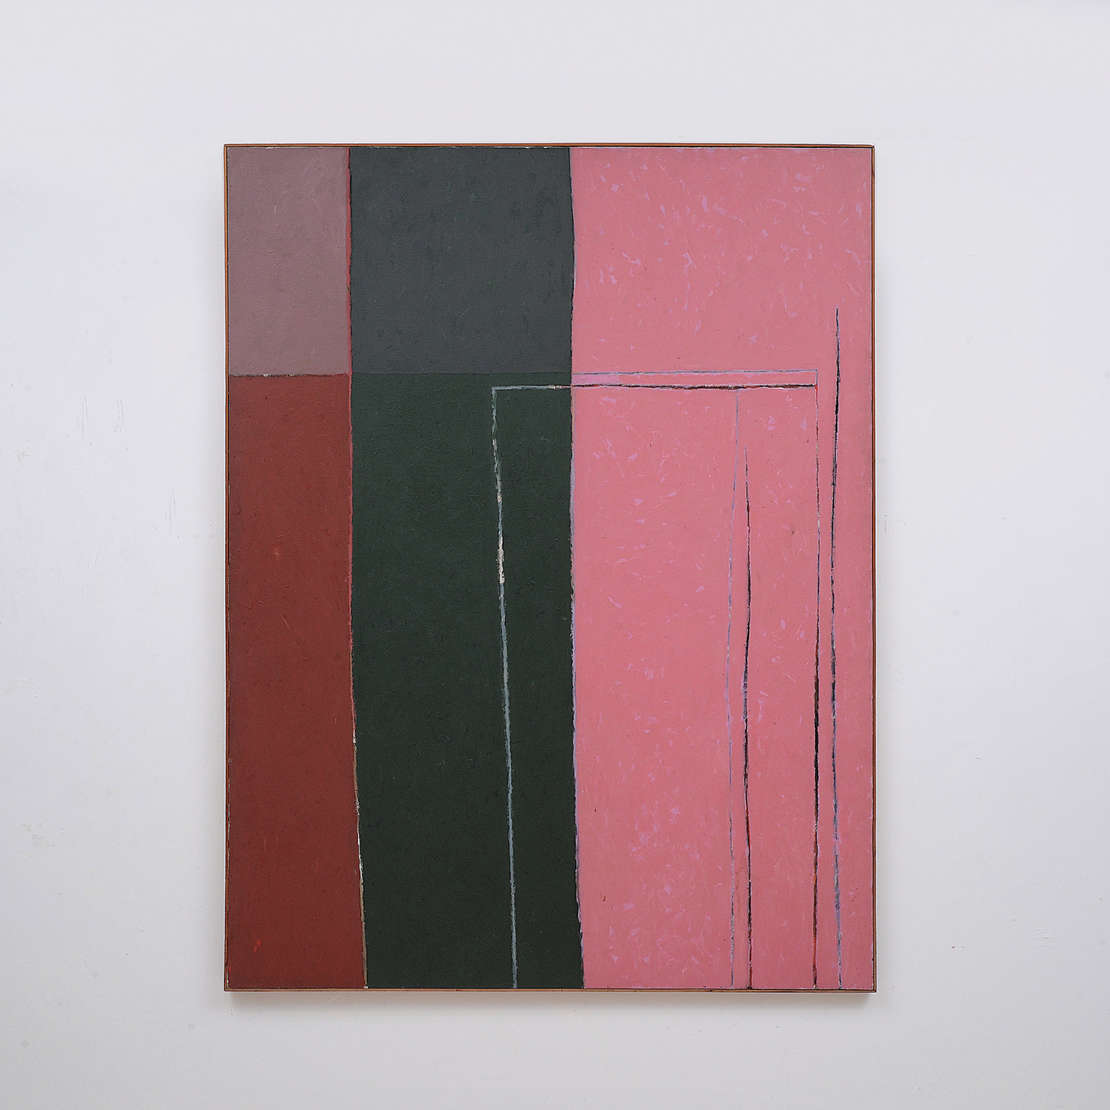 Gonçalo Ivo (1958), PINTURA ROSA, 1987 - Óleo s/ tela